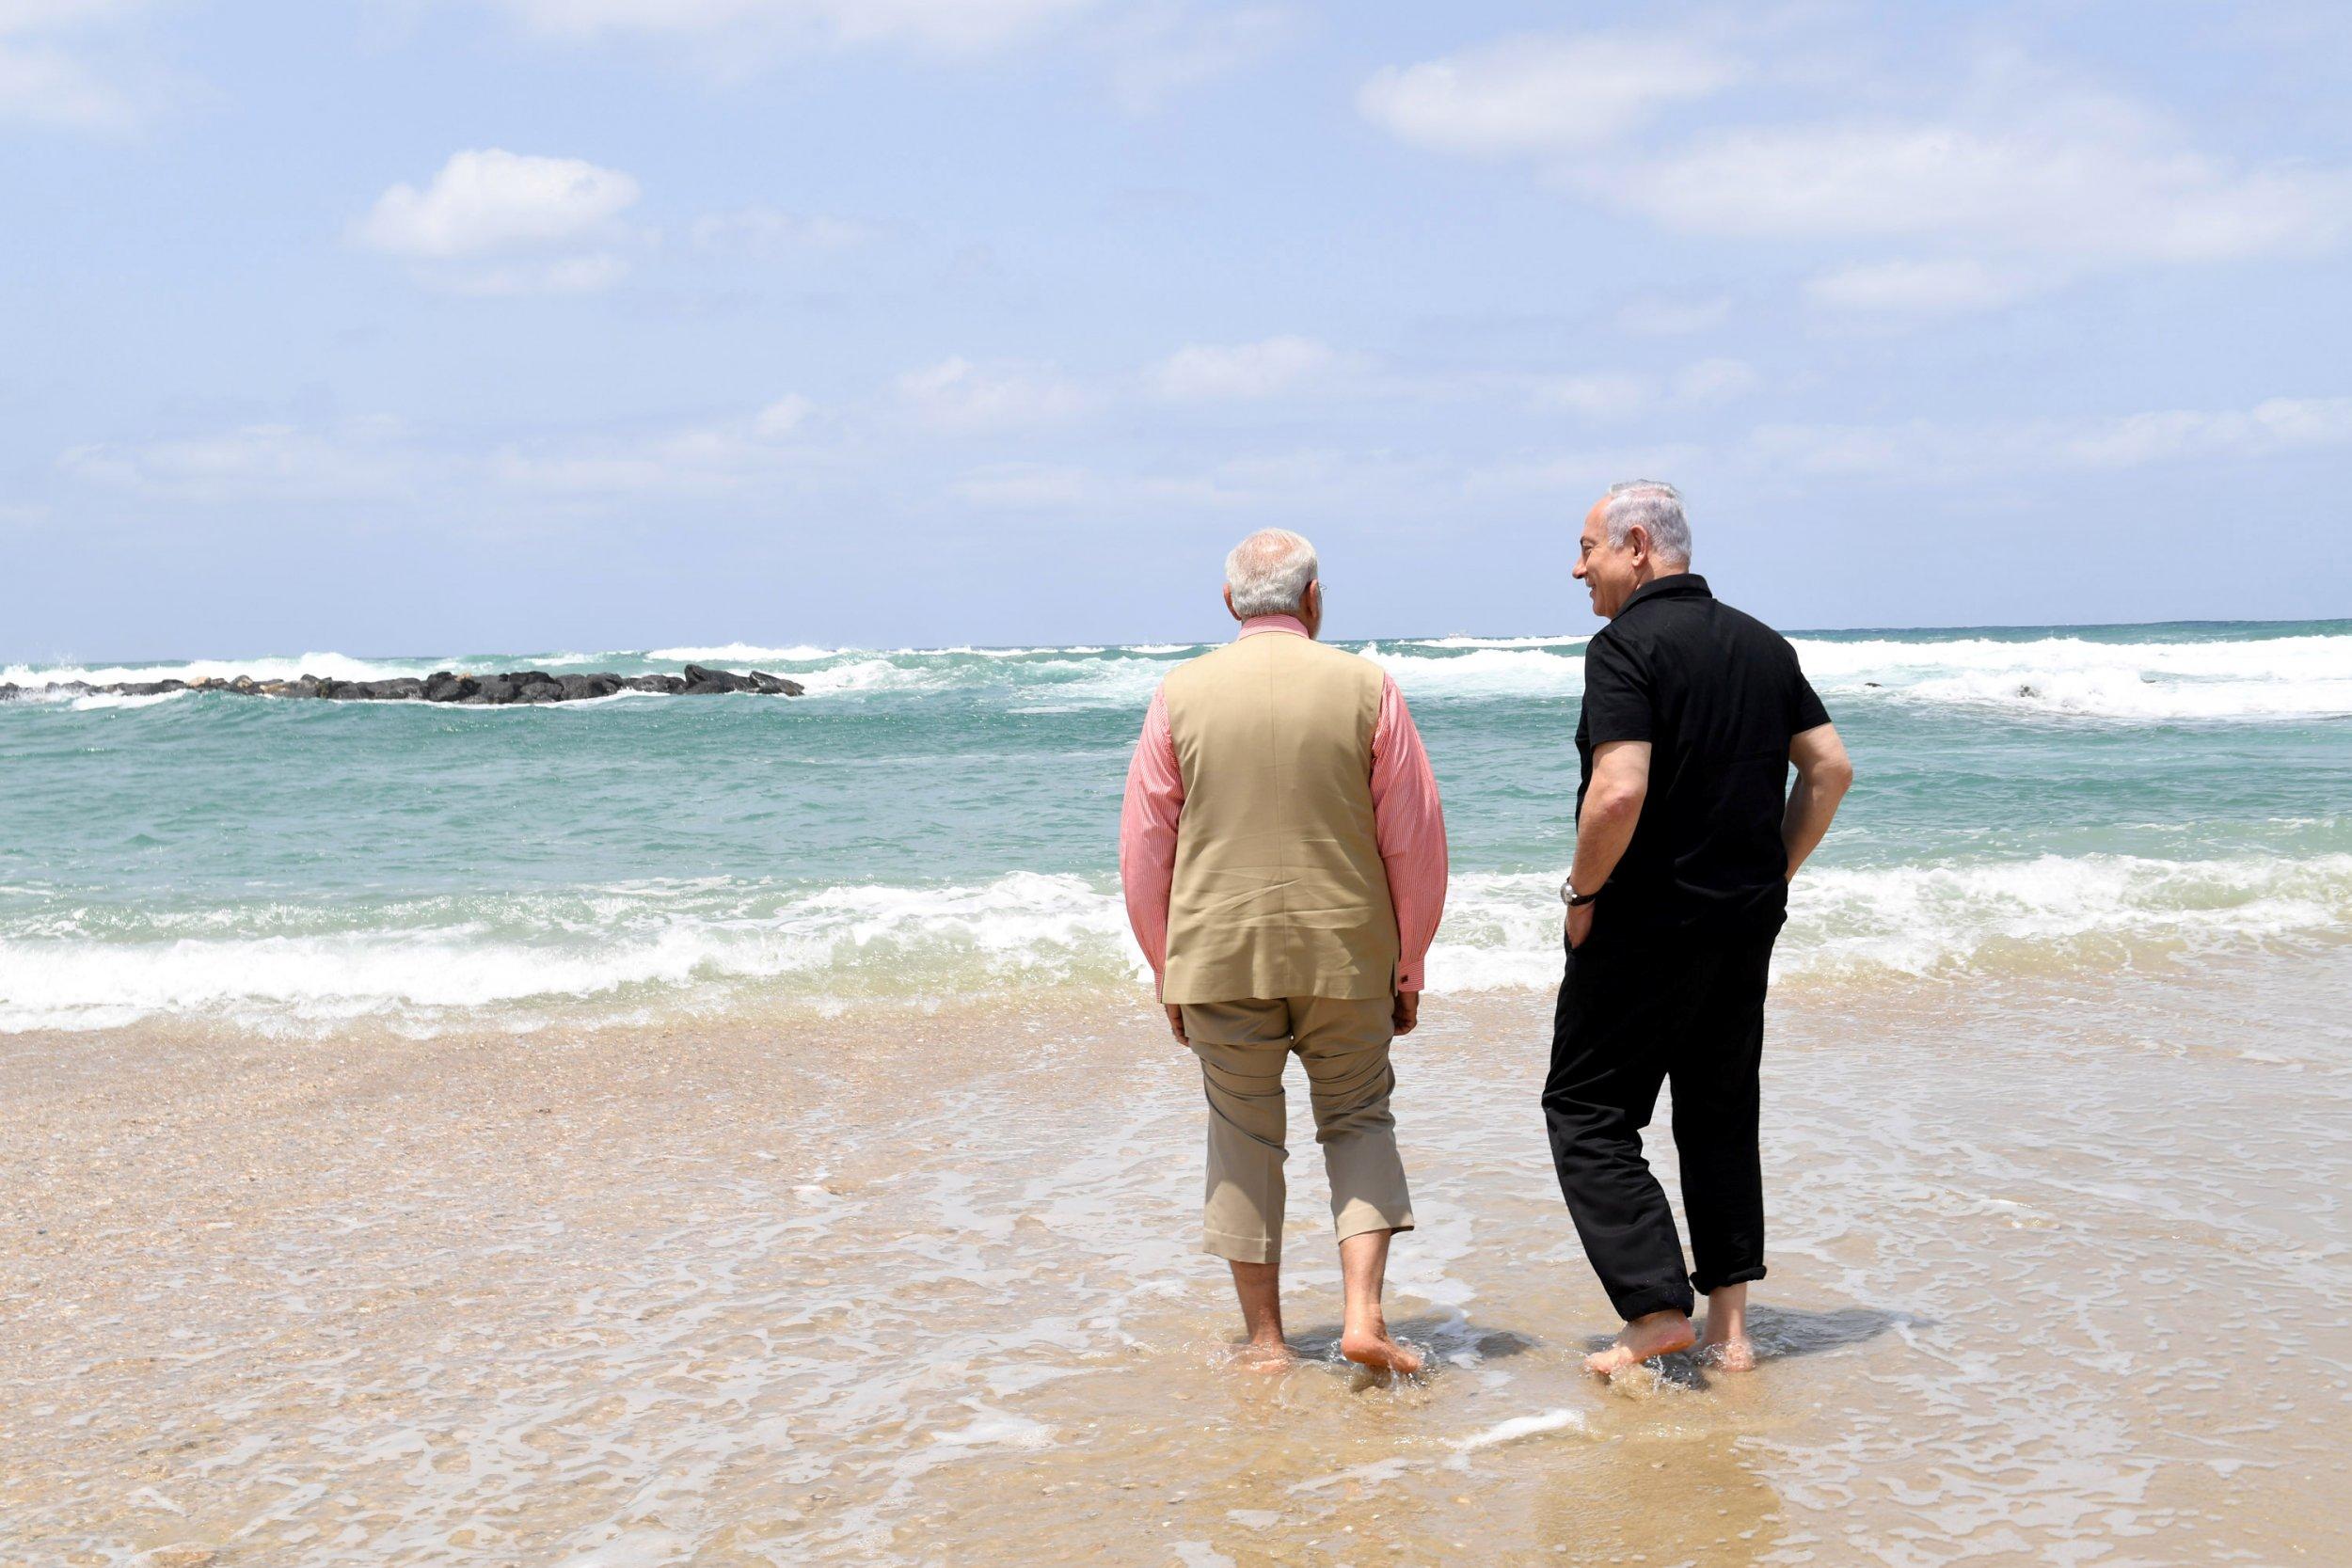 http://s.newsweek.com/sites/www.newsweek.com/files/styles/full/public/2017/07/06/modi-and-netanyahu.jpg